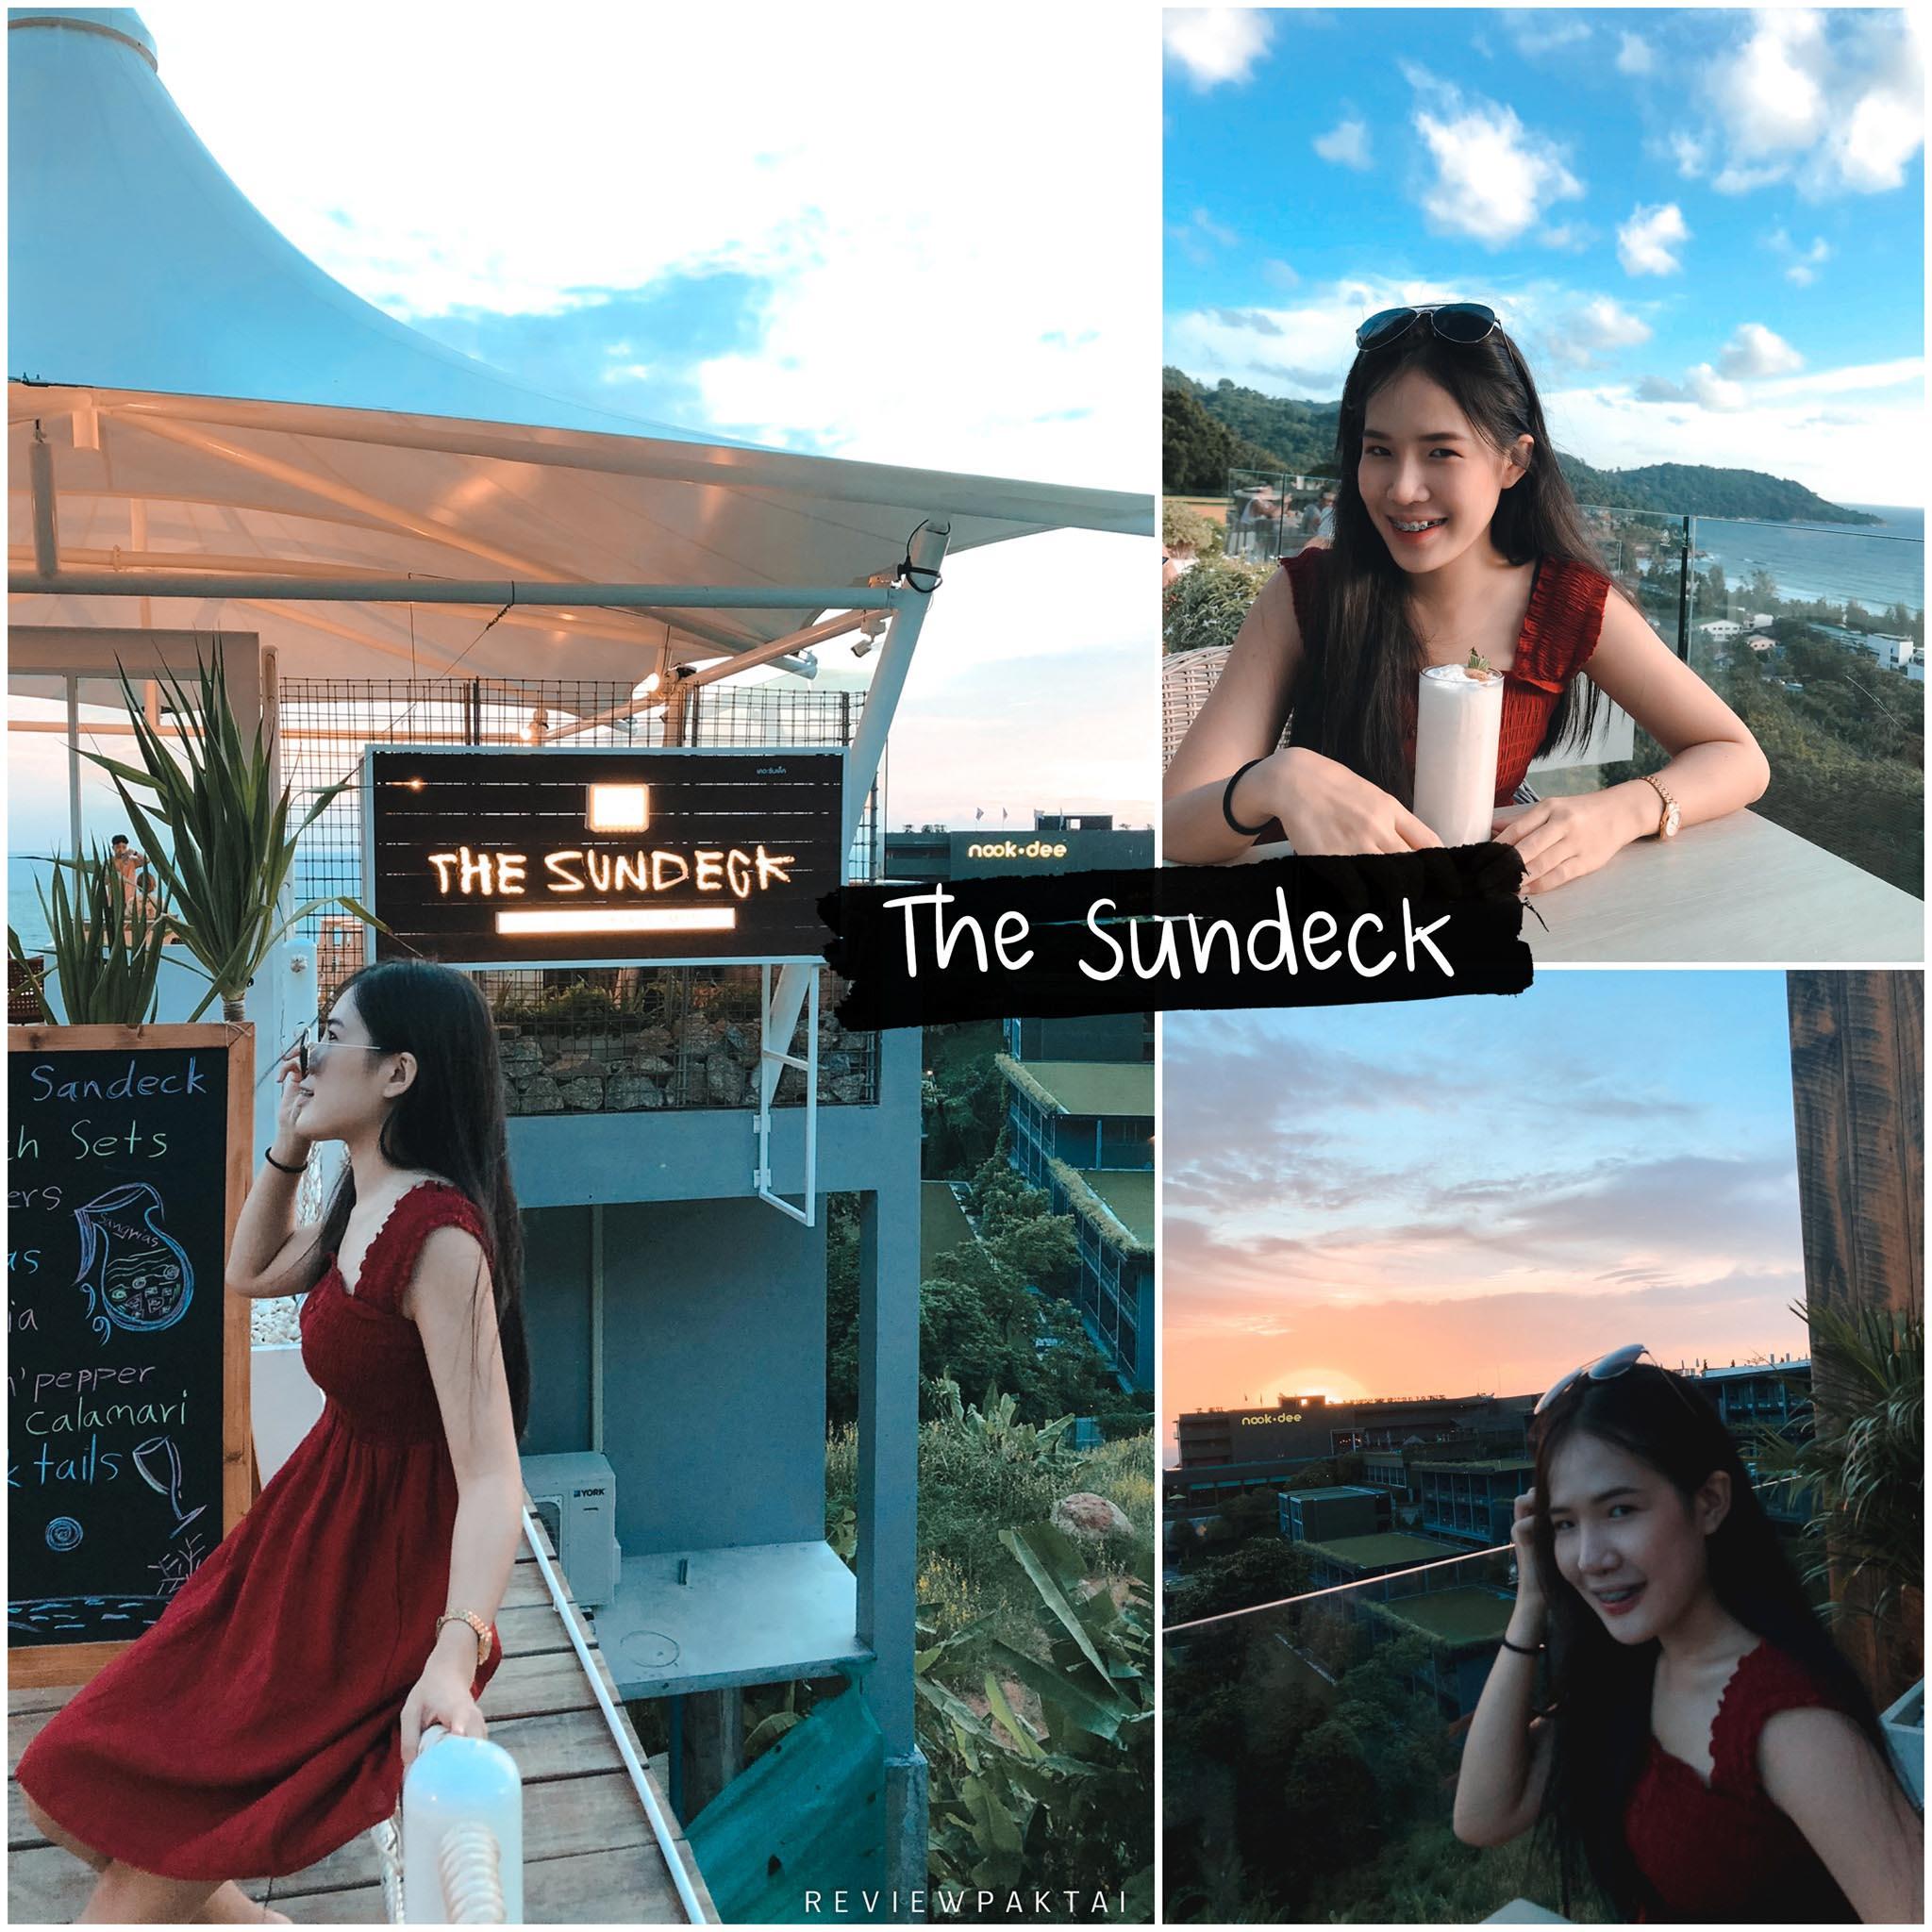 The-sundeck ภูเก็ต,คาเฟ่,ที่เที่ยว,ร้านกาแฟ,เด็ด,อร่อย,ต้องลอง